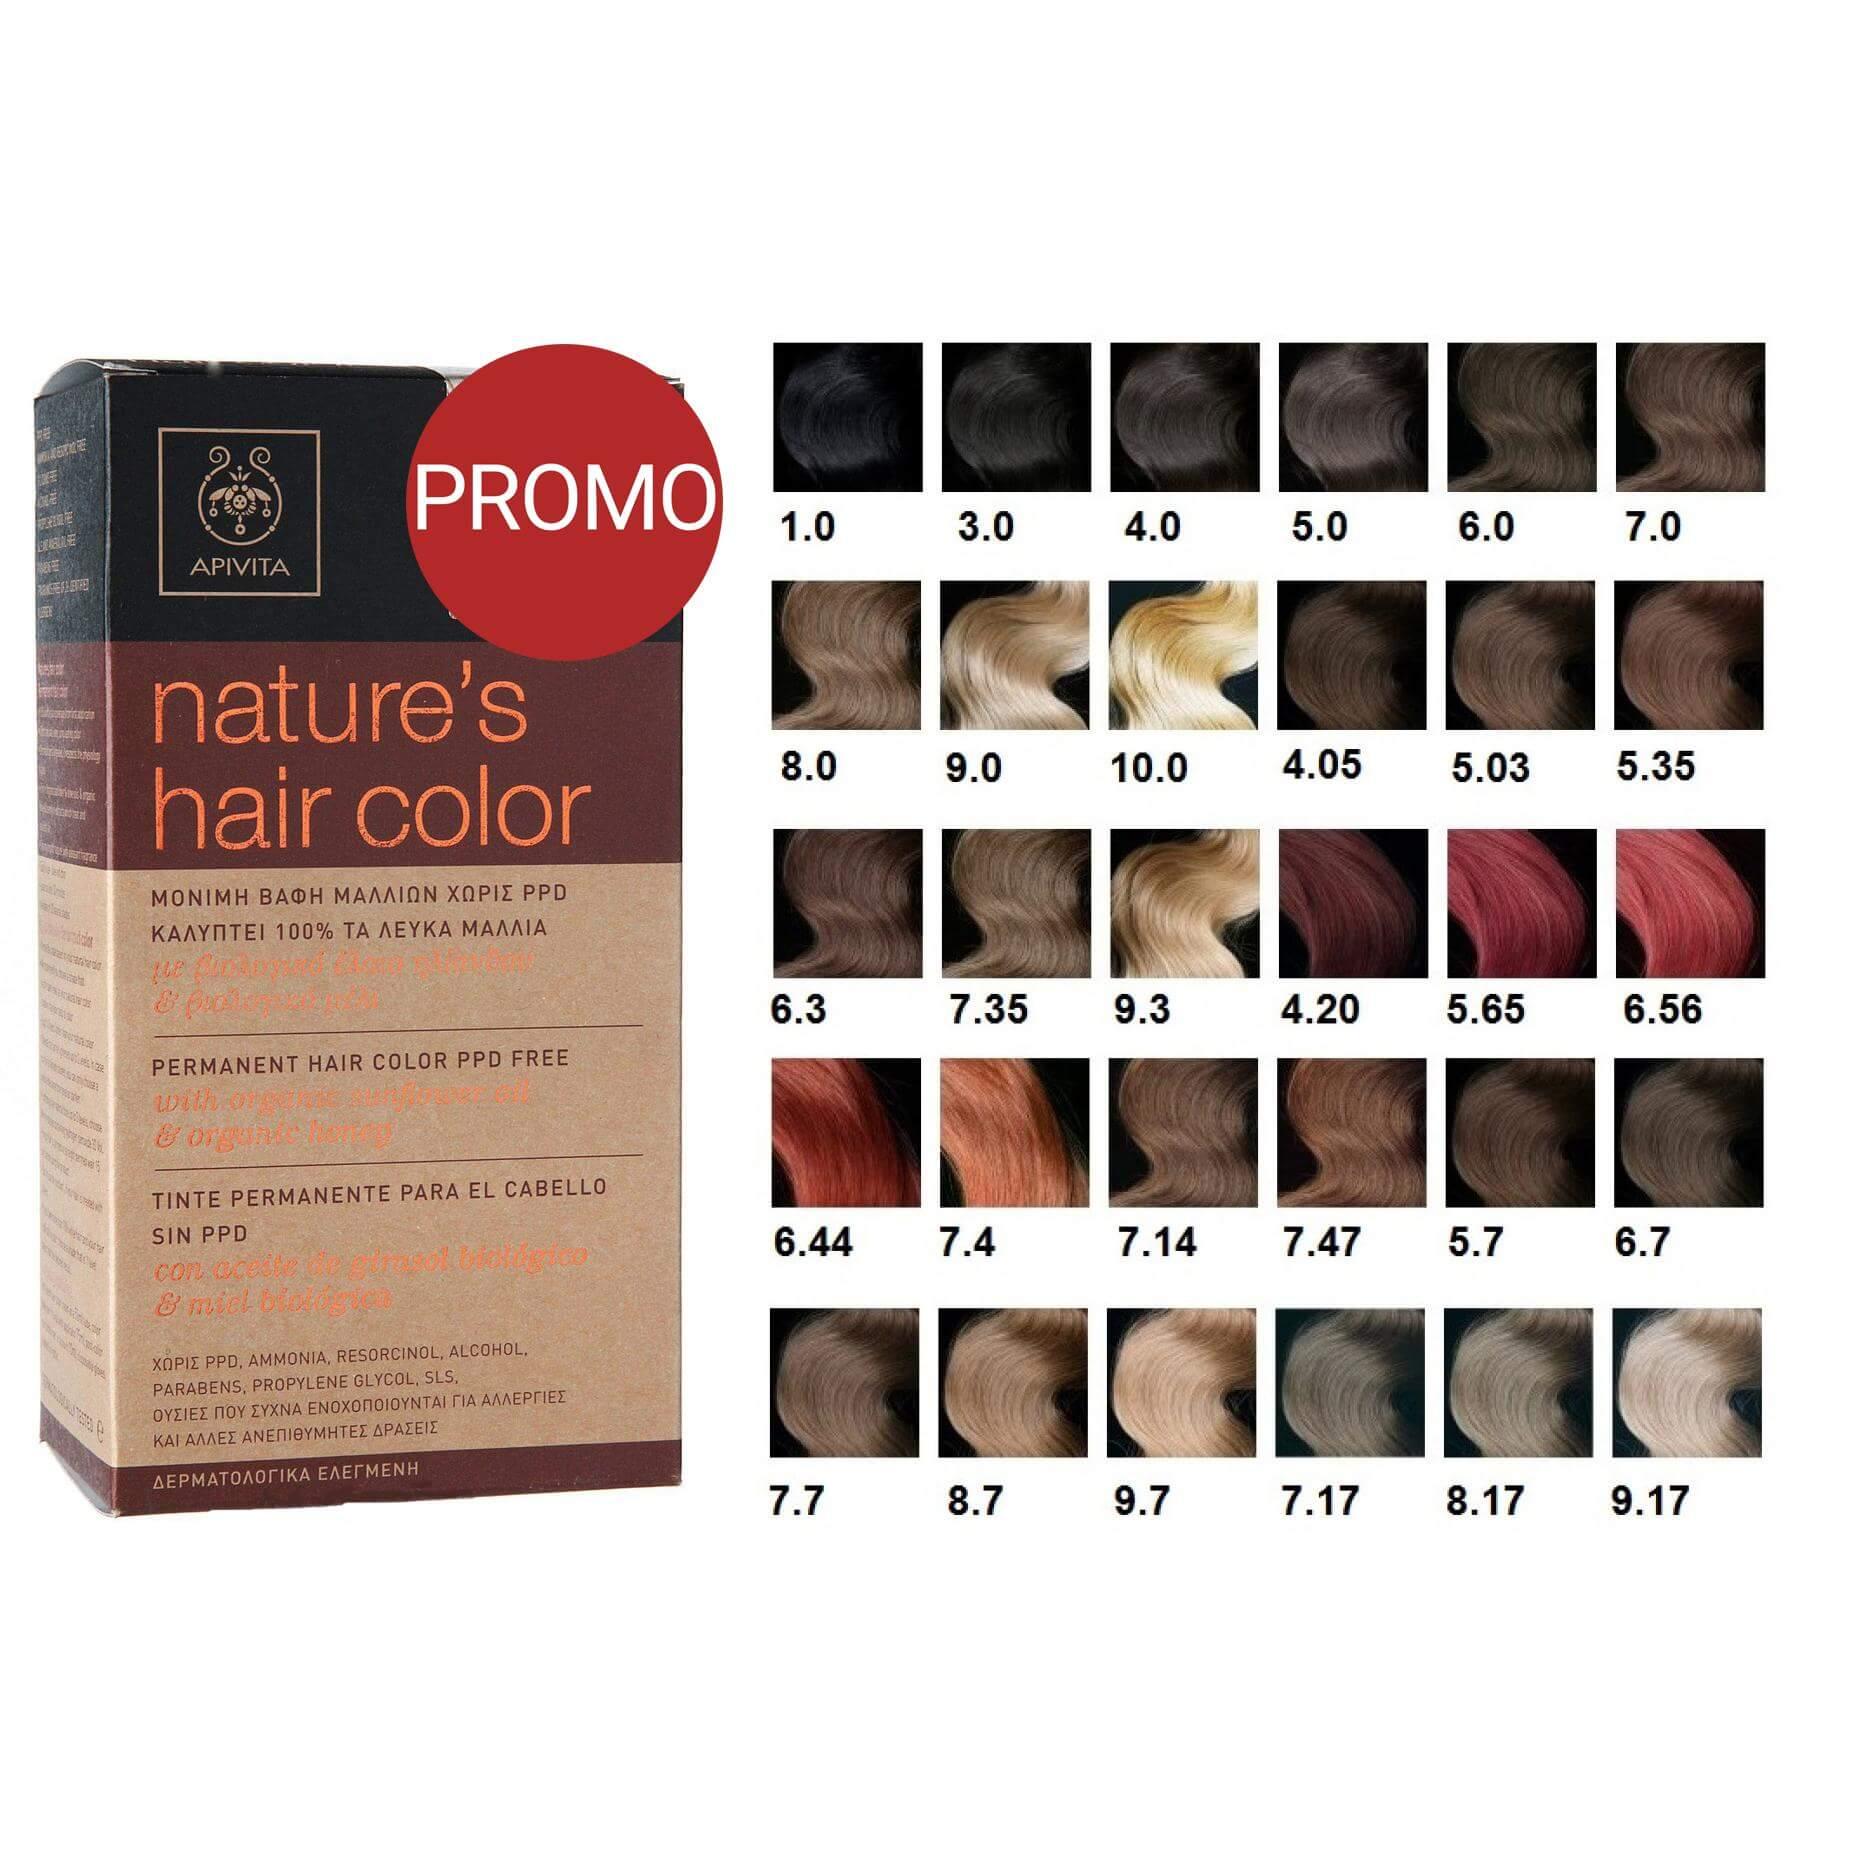 Apivita Βαφές Μαλλιών Natures Hair Color Με Μέλι & Ηλίανθο Προσφορά – 20% – 3.0 Καστανό Σκούρο